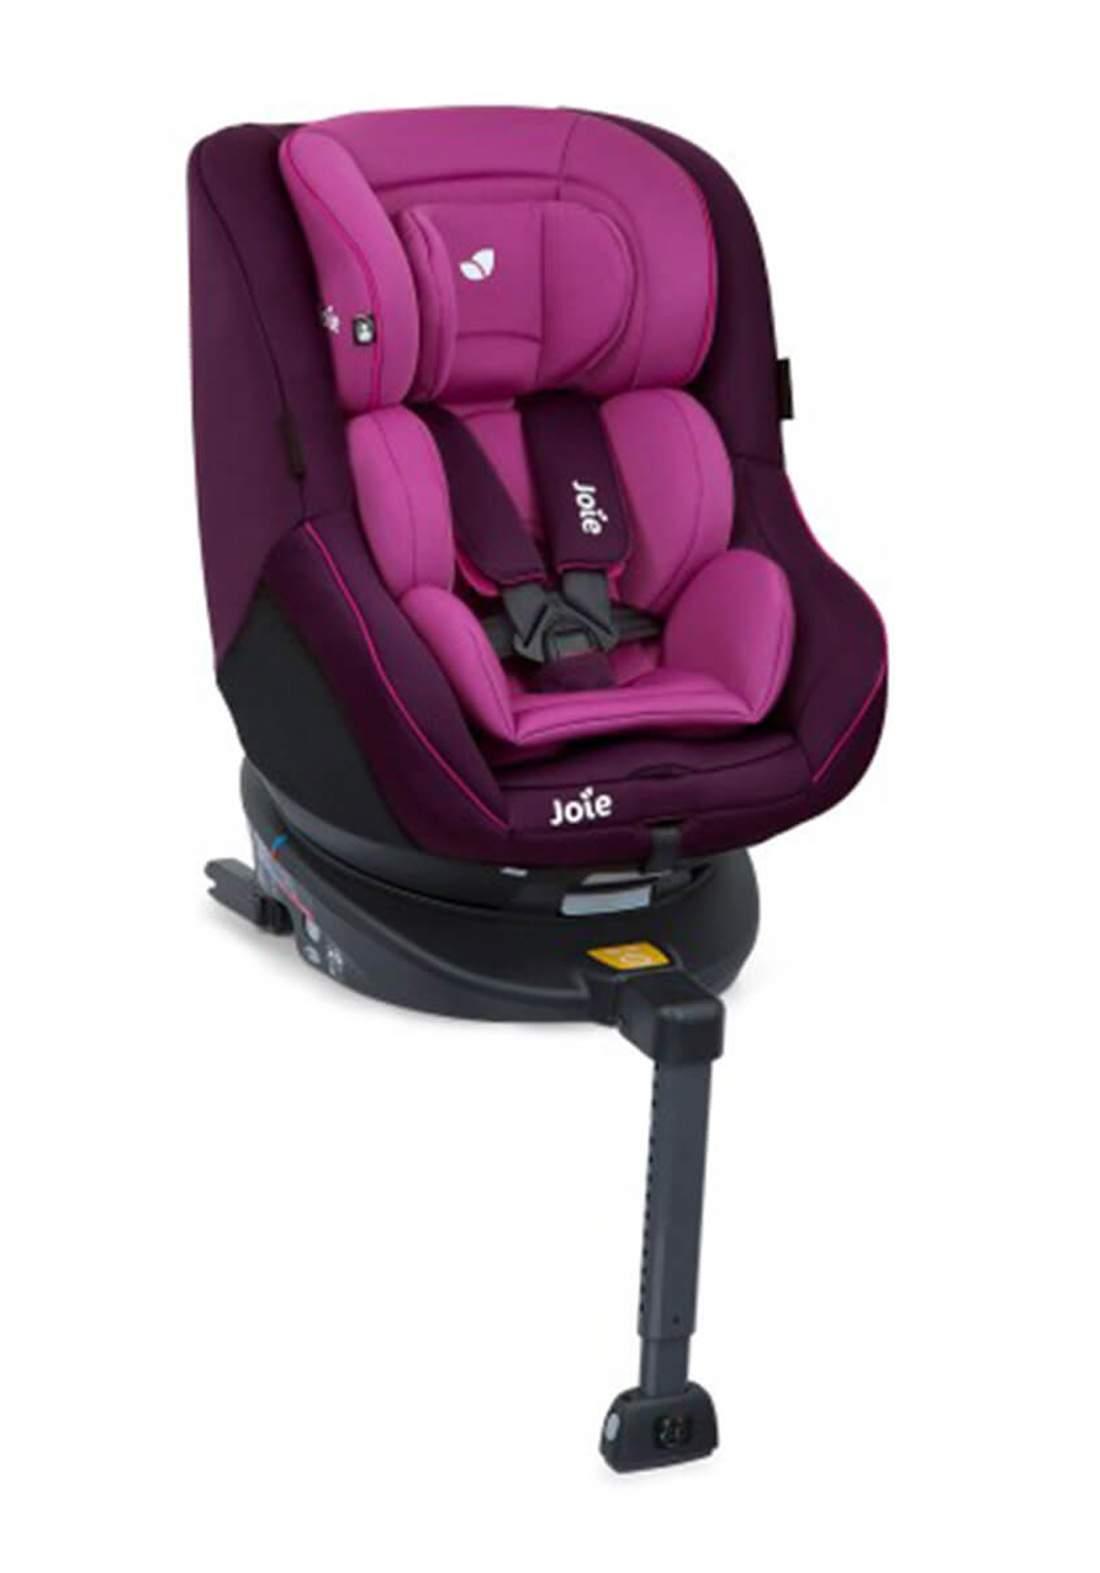 Joie Baby C1416AALIL000  Babyjoie Reboarder child seat Spin 360° - LilacCar seat 18 kg(0+4) مقعد سيارة للاطفال